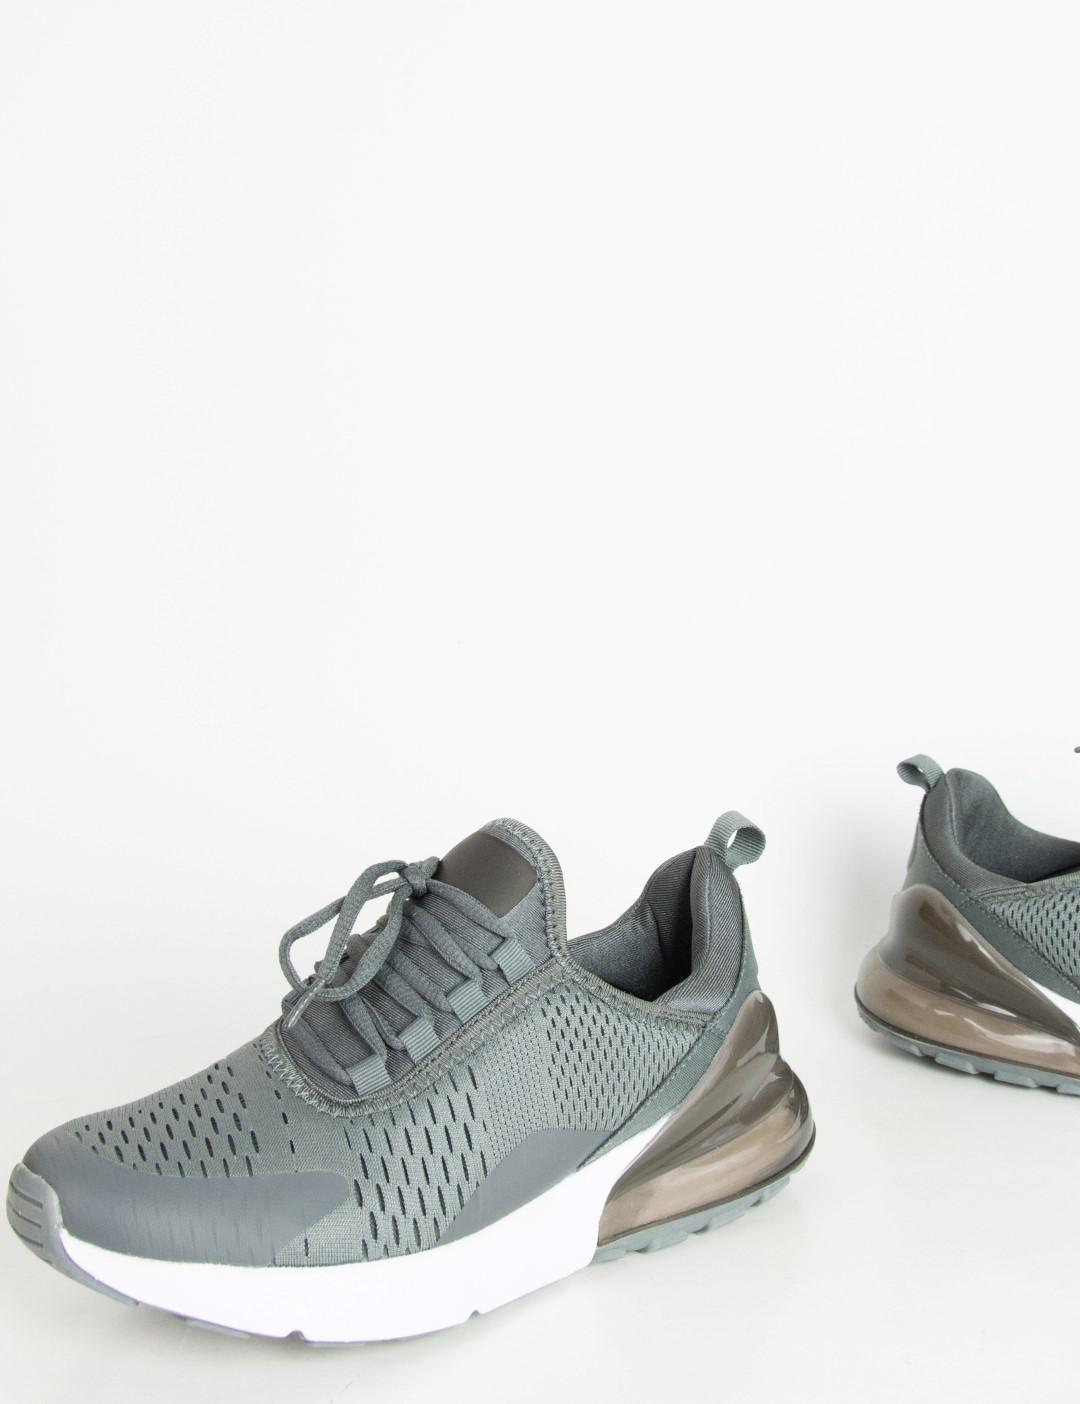 1ca5da16b093 Ανδρικά Αθλητικά Παπούτσια 2019 από το ToRouxo.gr